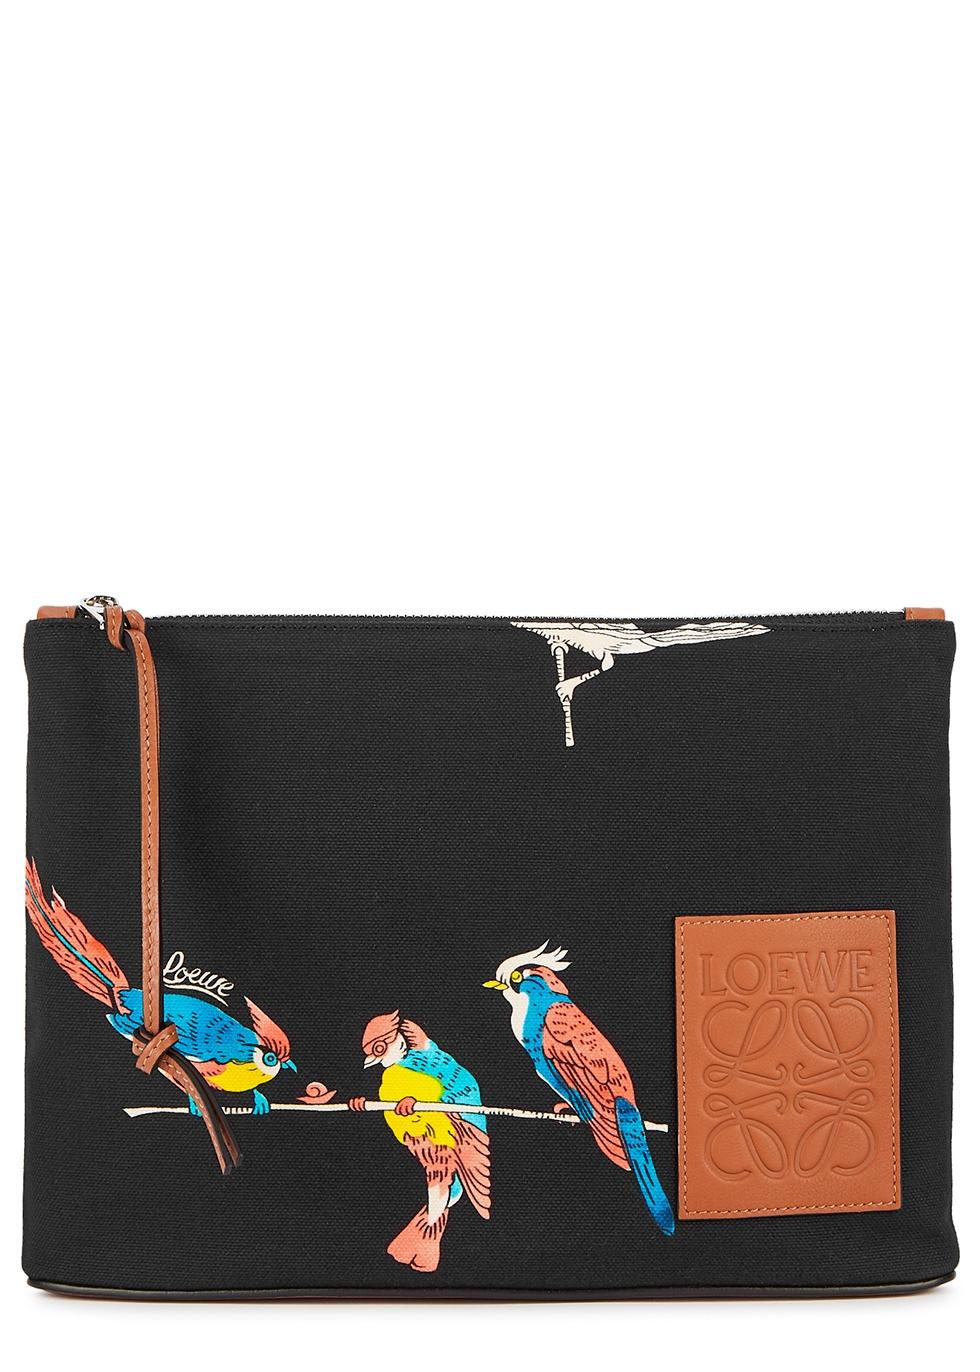 X Paula's Ibiza black printed canvas pouch